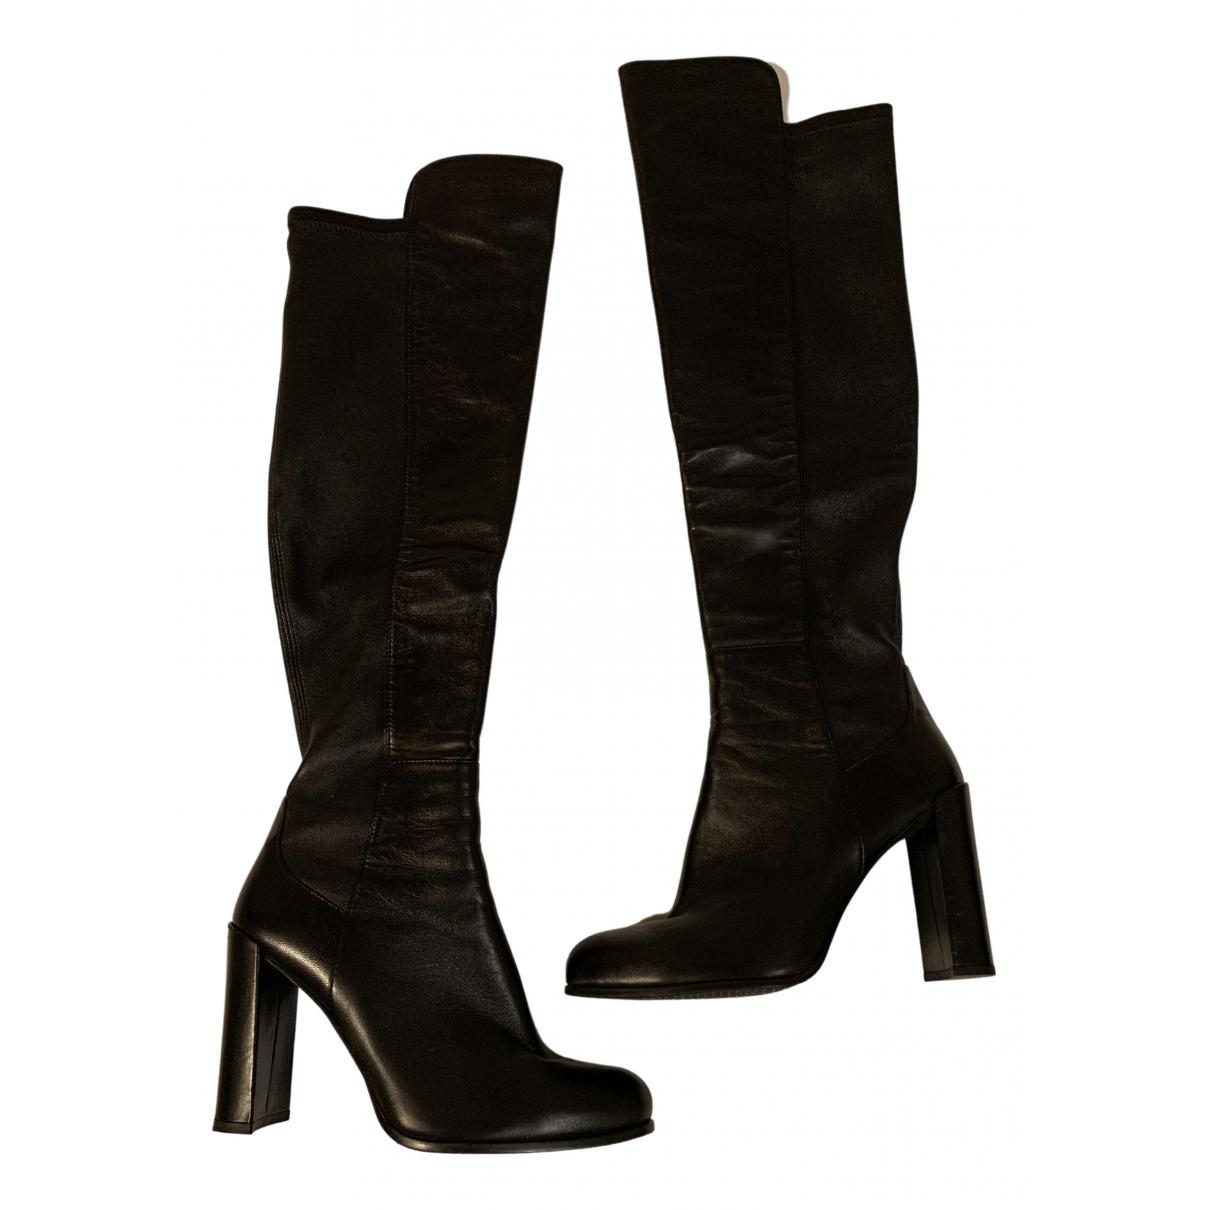 Stuart Weitzman N Black Leather Boots for Women 40.5 EU